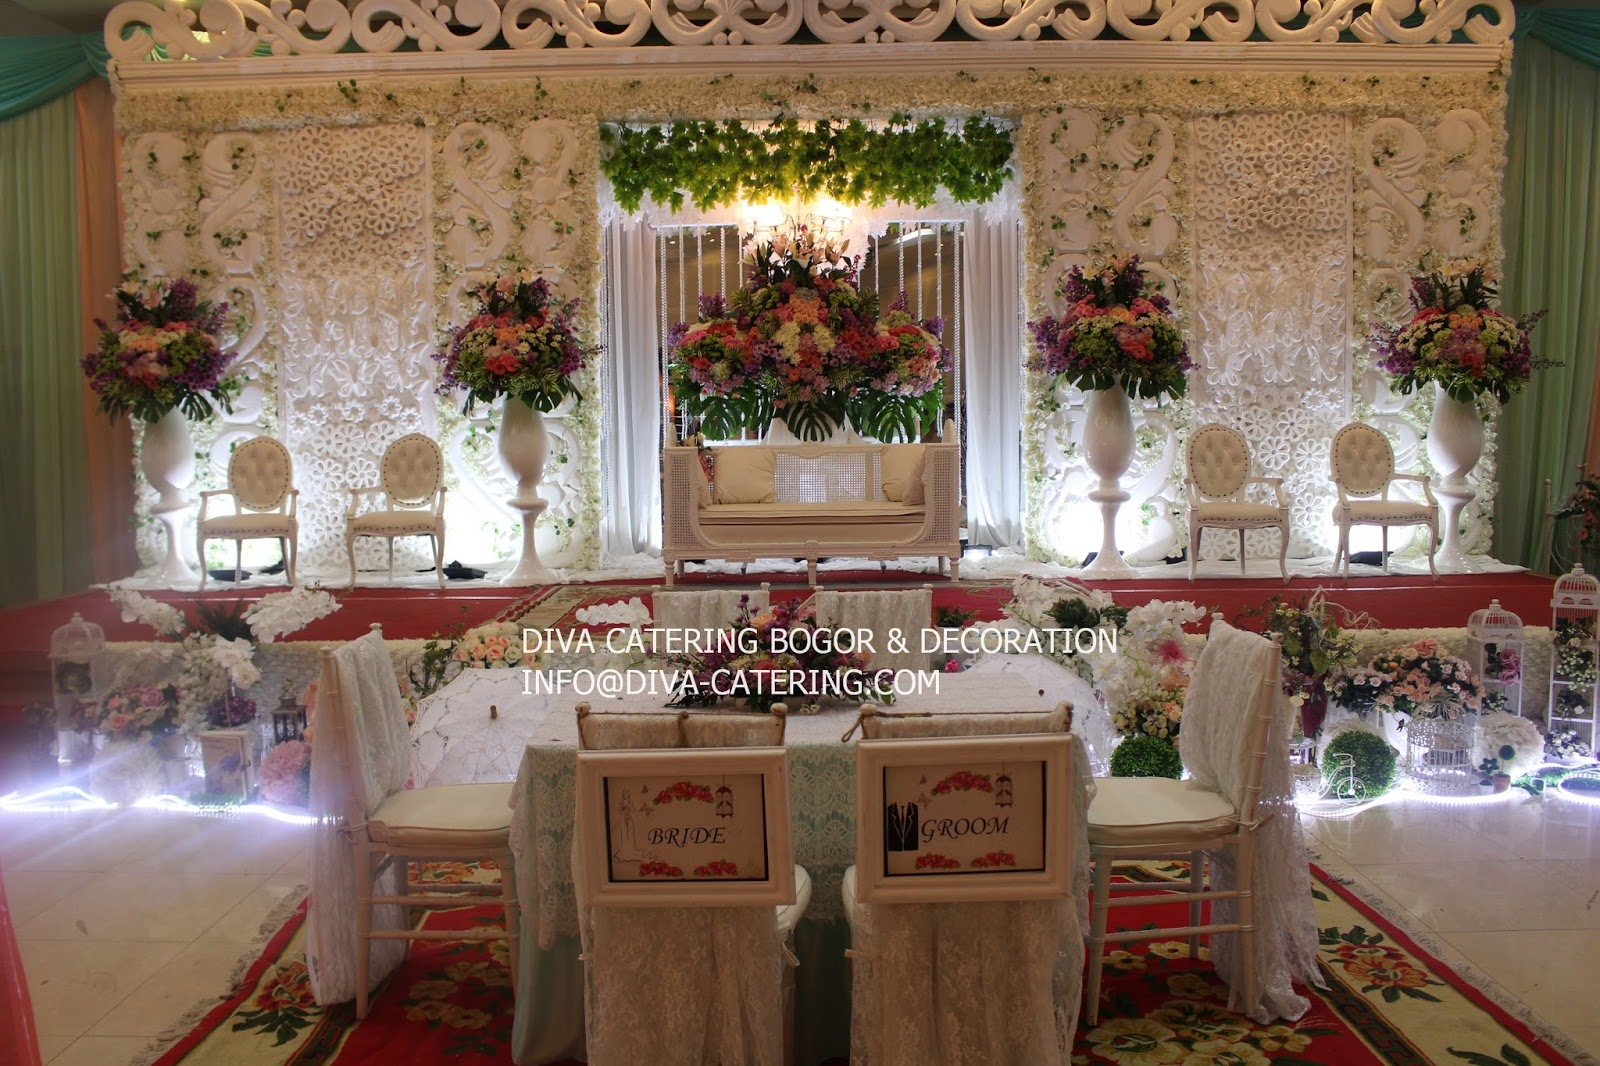 Gallery pelaminan diva catering bogor wedding planner wedding untuk informasi paket service kami bisa menghubungi anie 08129948752 wa email infodiva catering website httpdiva catering junglespirit Gallery